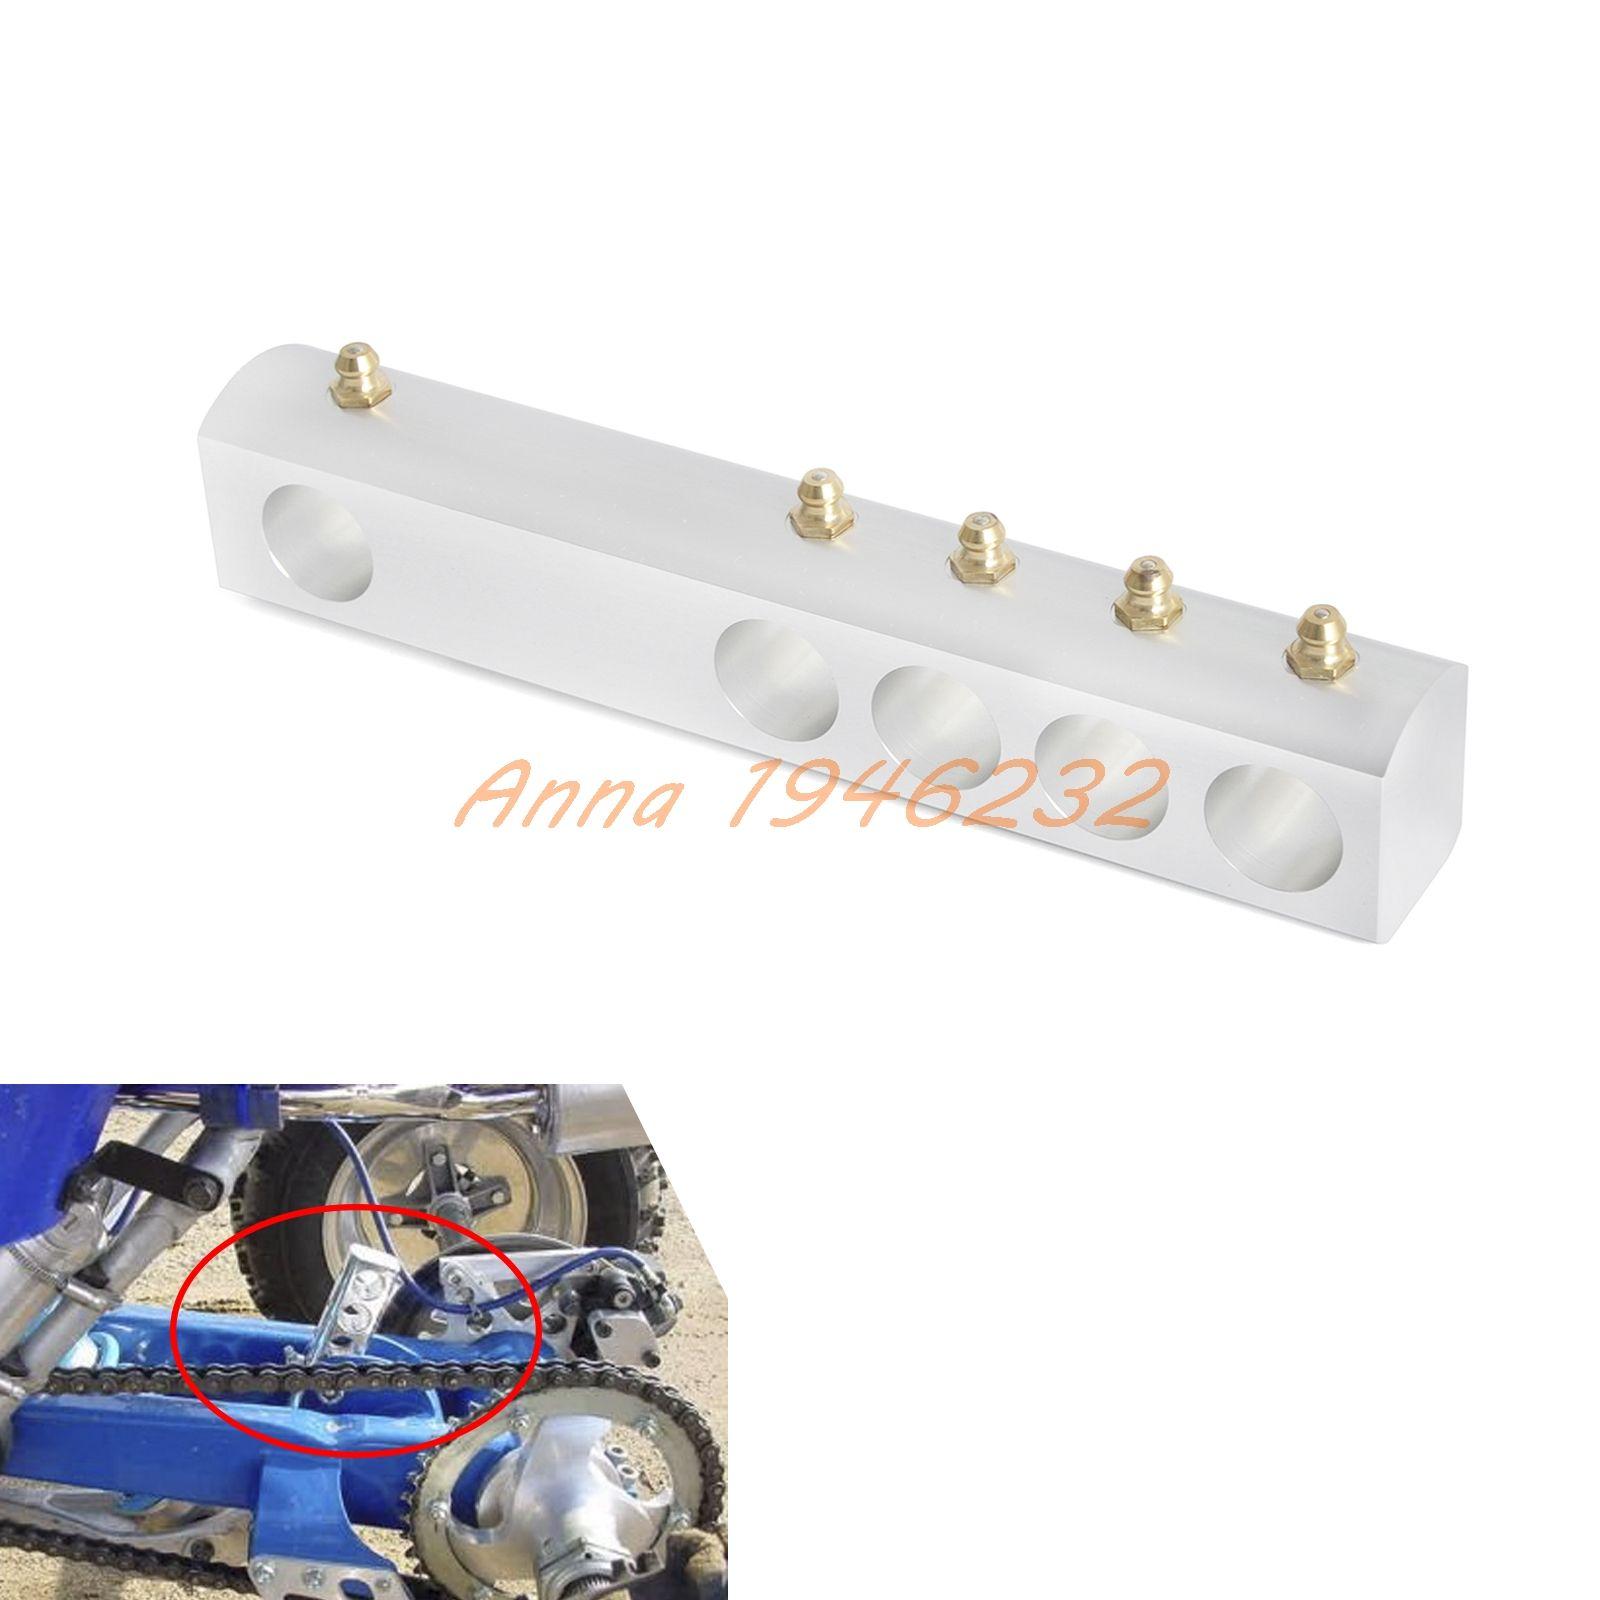 Wholesale Cnc Adjustable Rear Lowering Kit For Yamaha Banshee